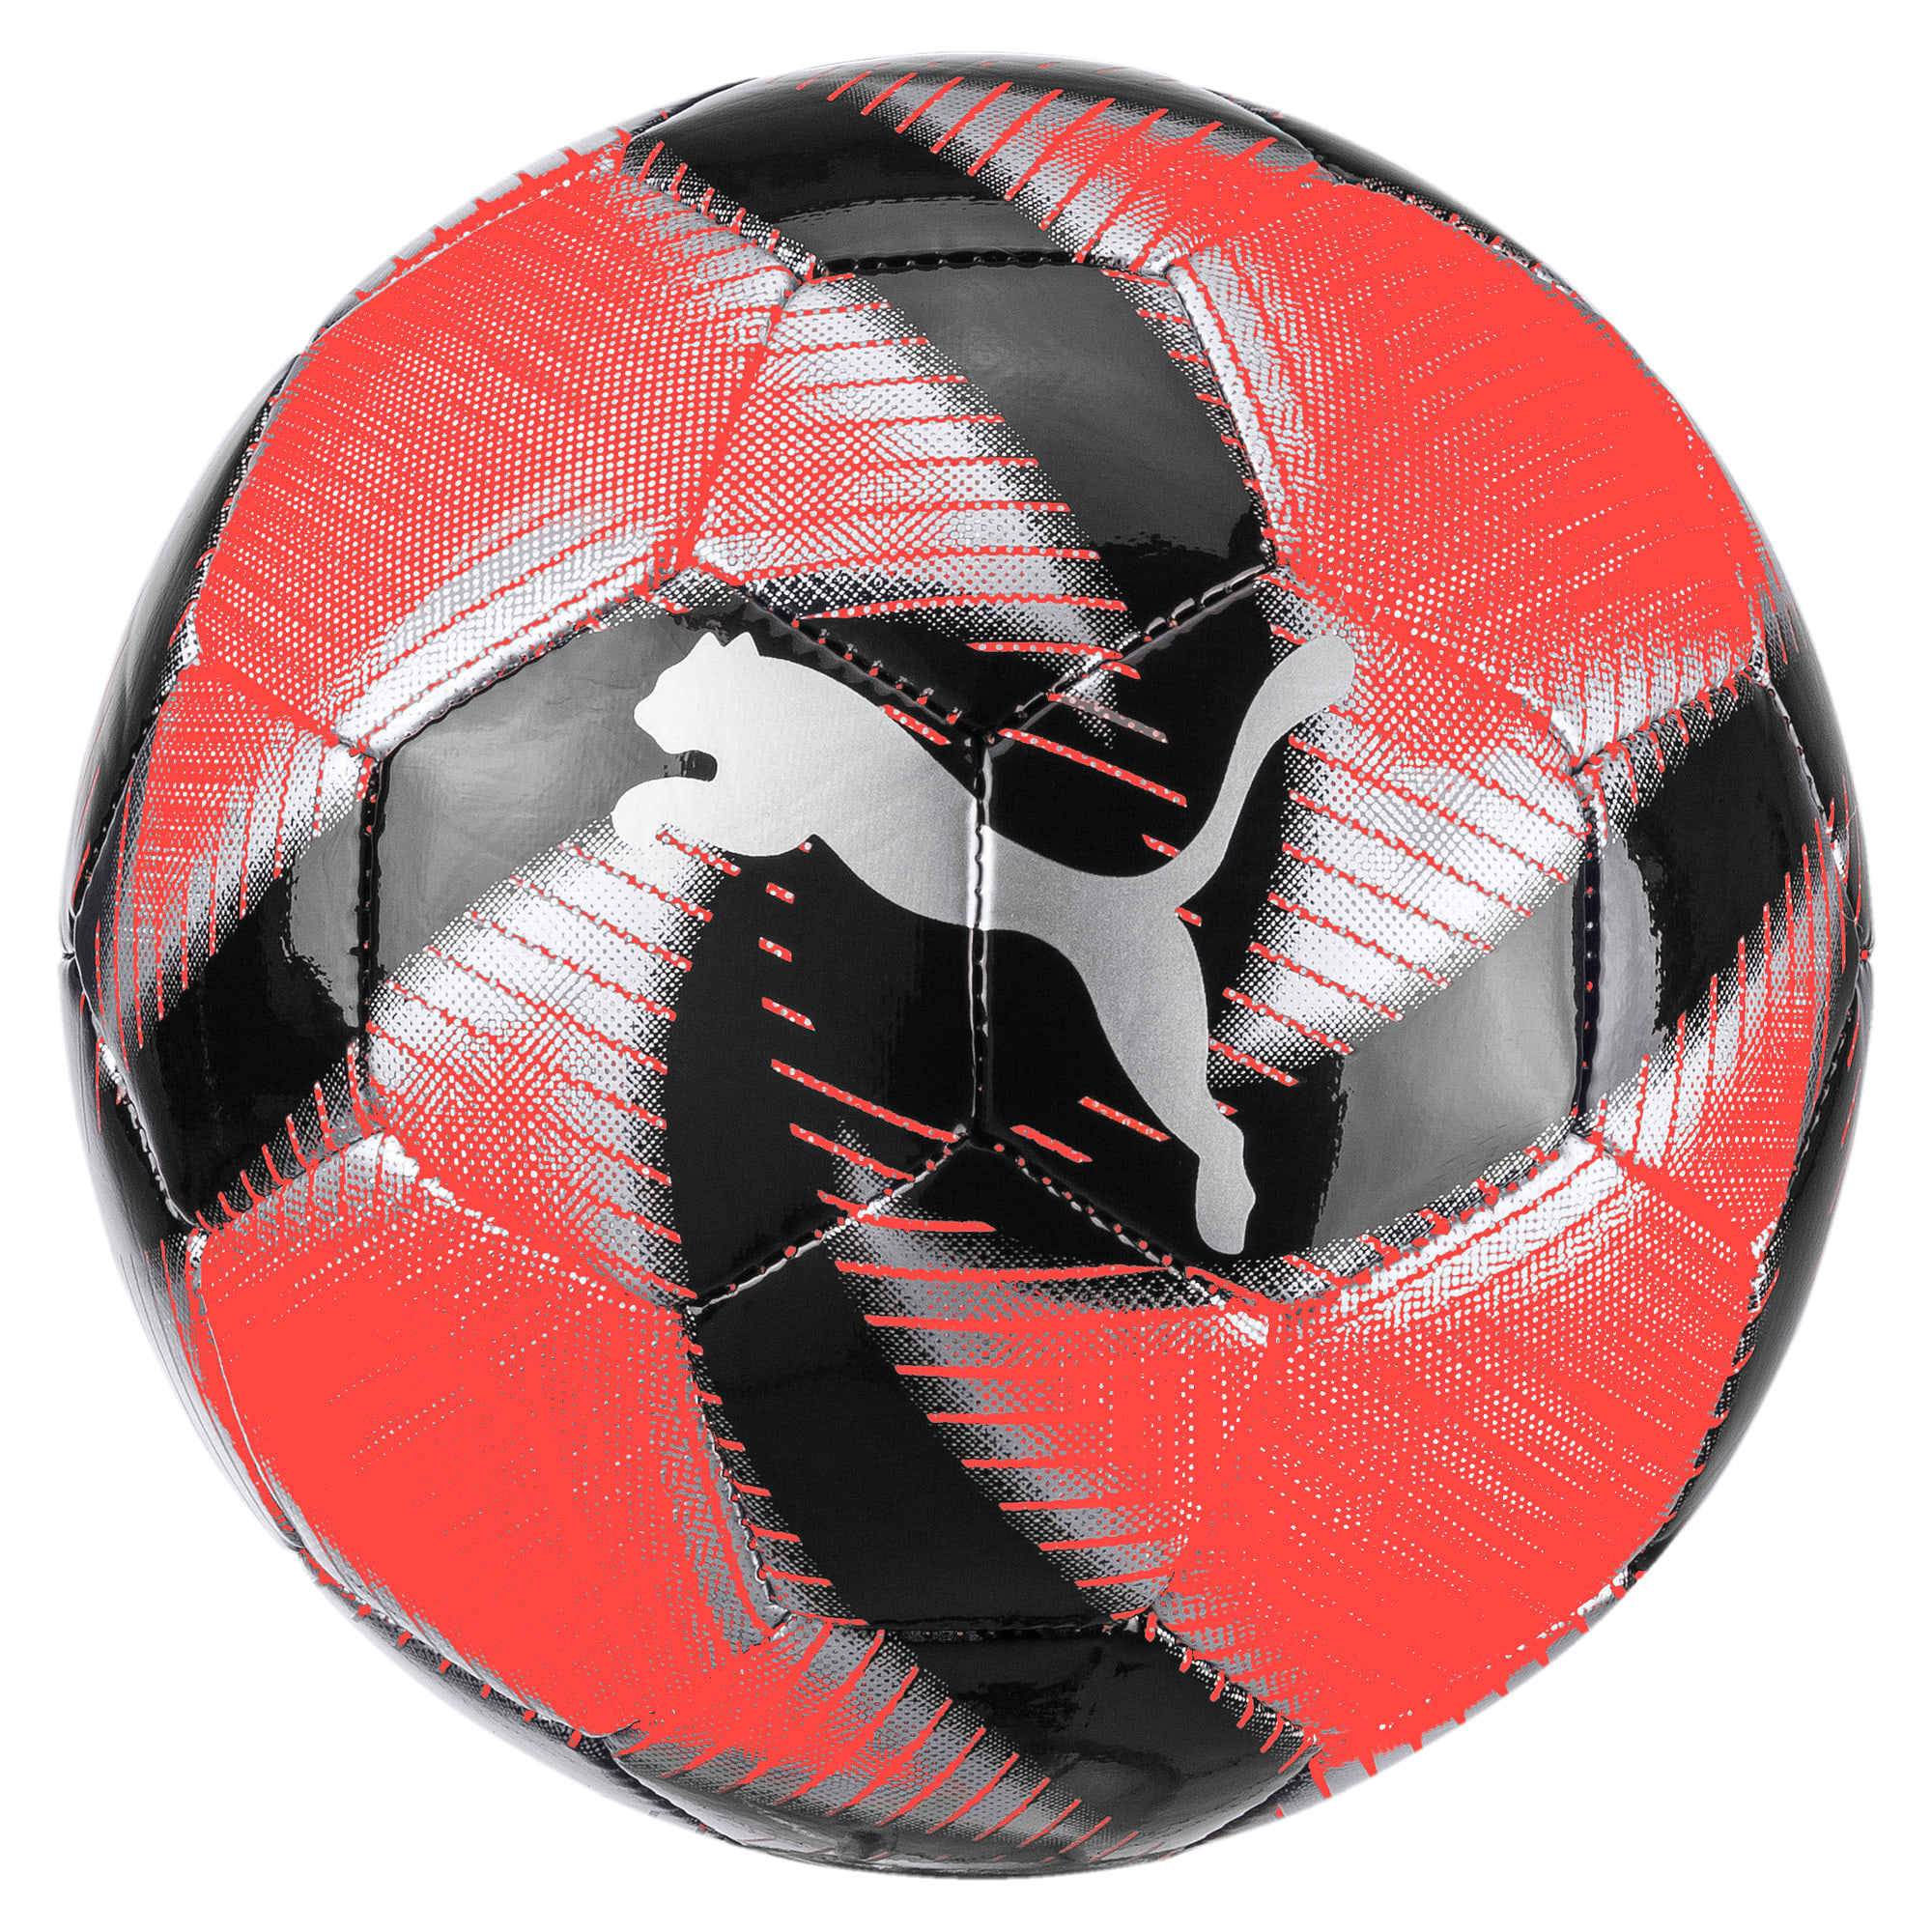 Thumbnail 1 of FUTURE Flare Mini Training Ball, Nrgy Red-Asphalt-Black-White, medium